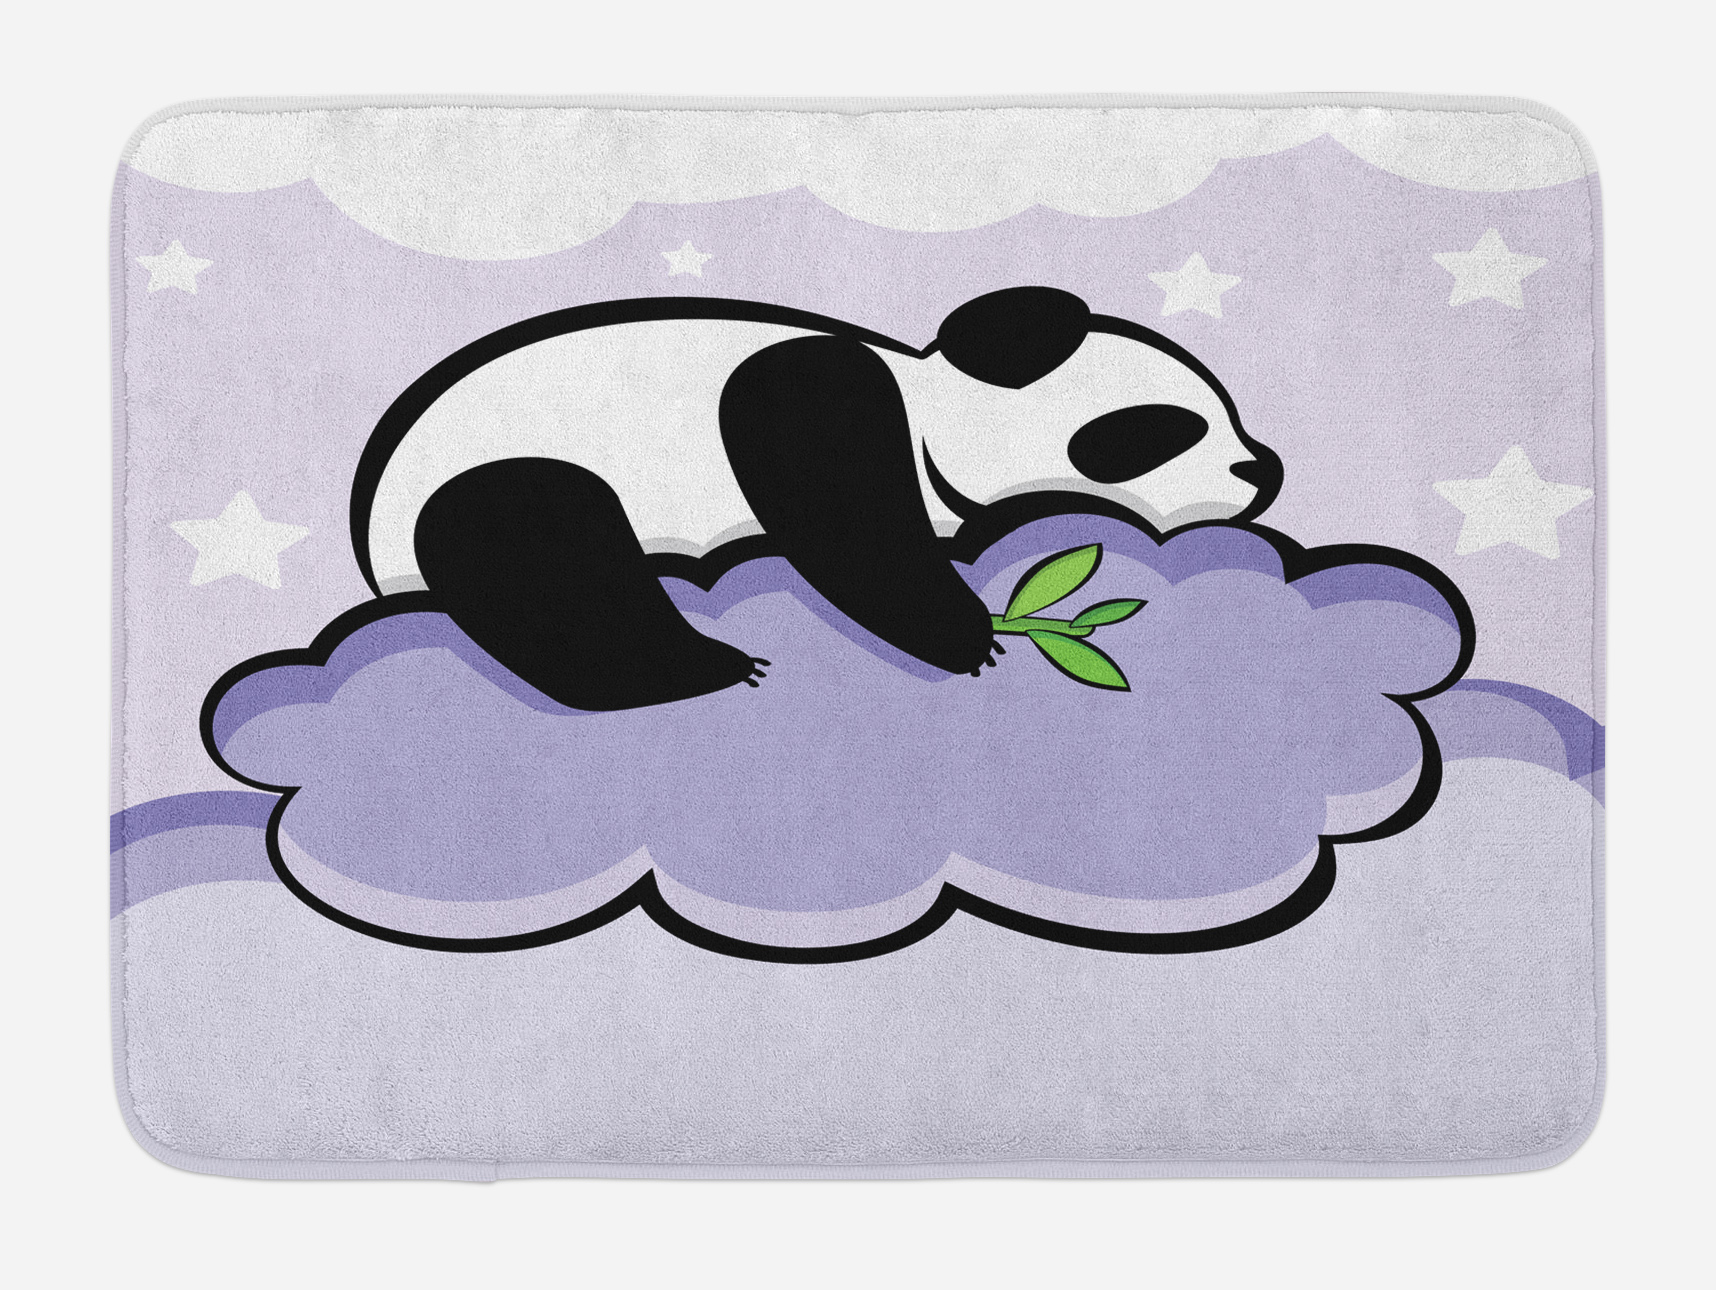 Panda Bath Mat, Panda Bear Sleeping on Cloud in Starry Night Sky Children Cartoon... by 3decor llc